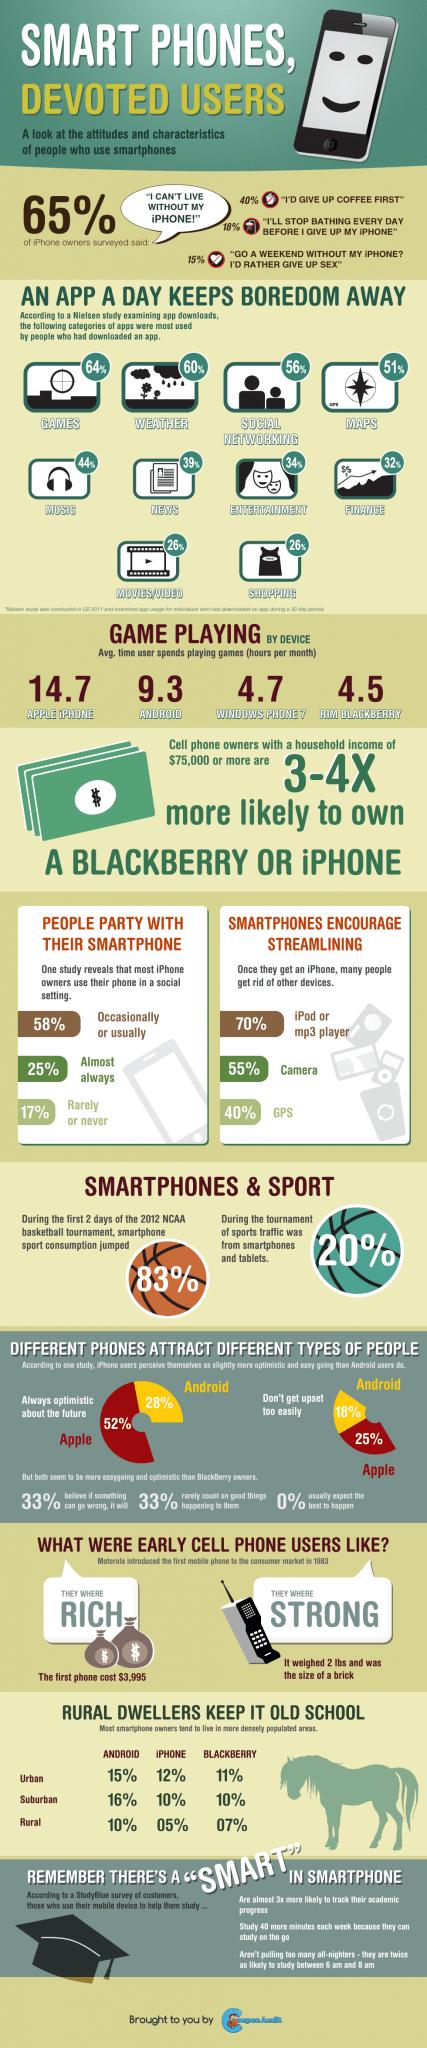 Smartphone Devoted Users